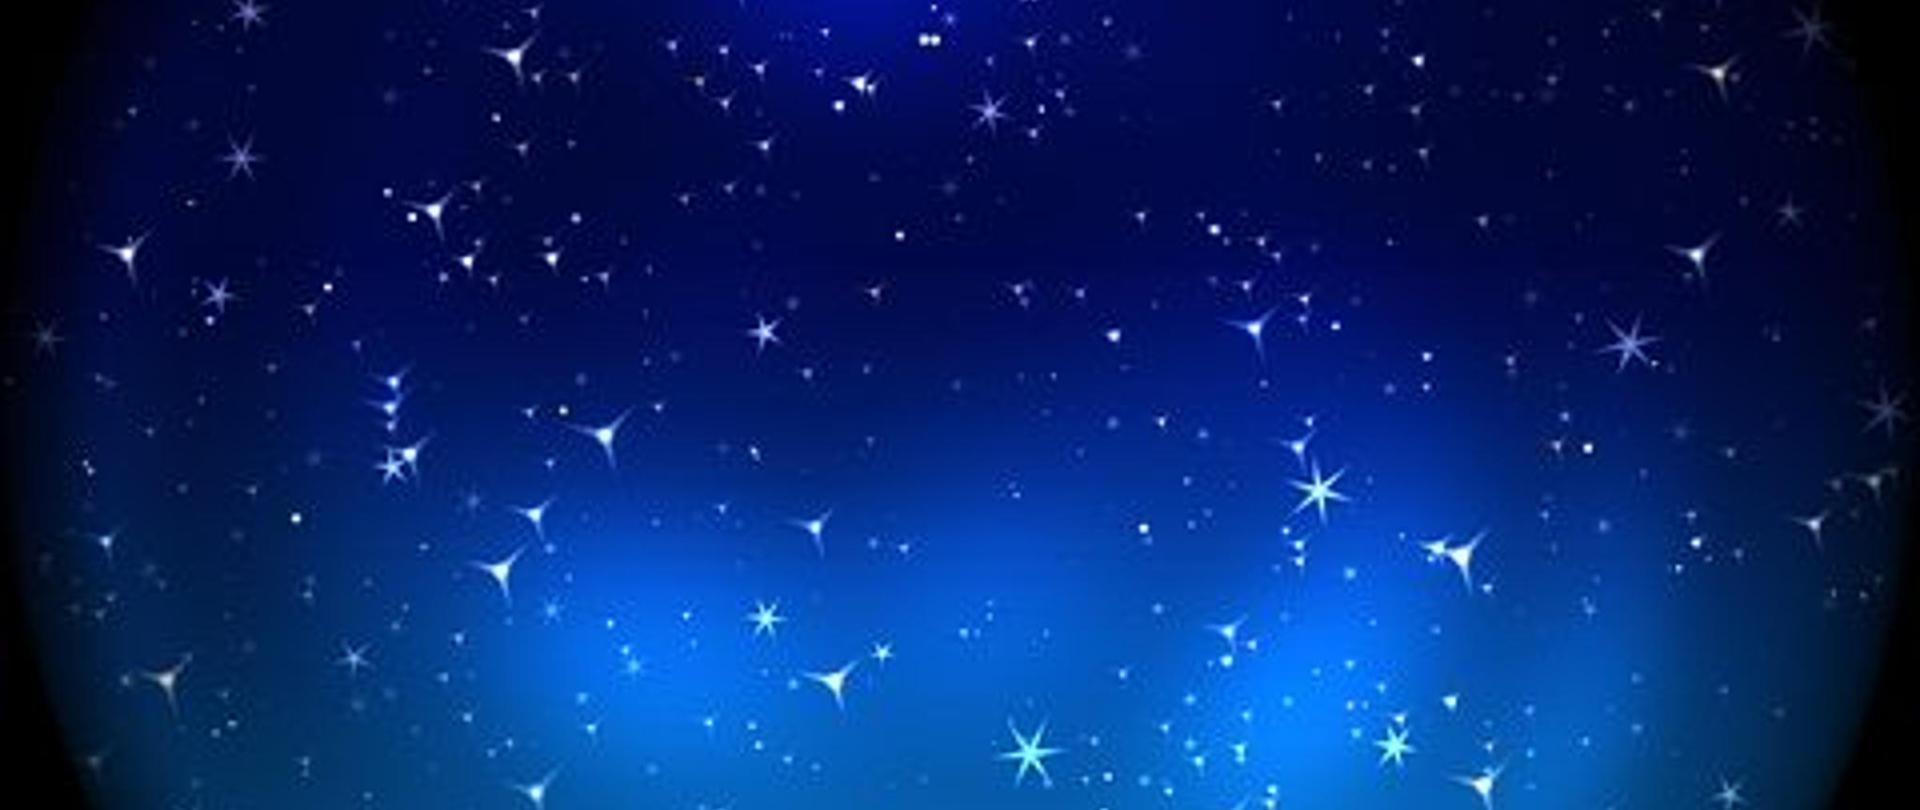 star-1553694__480.jpg